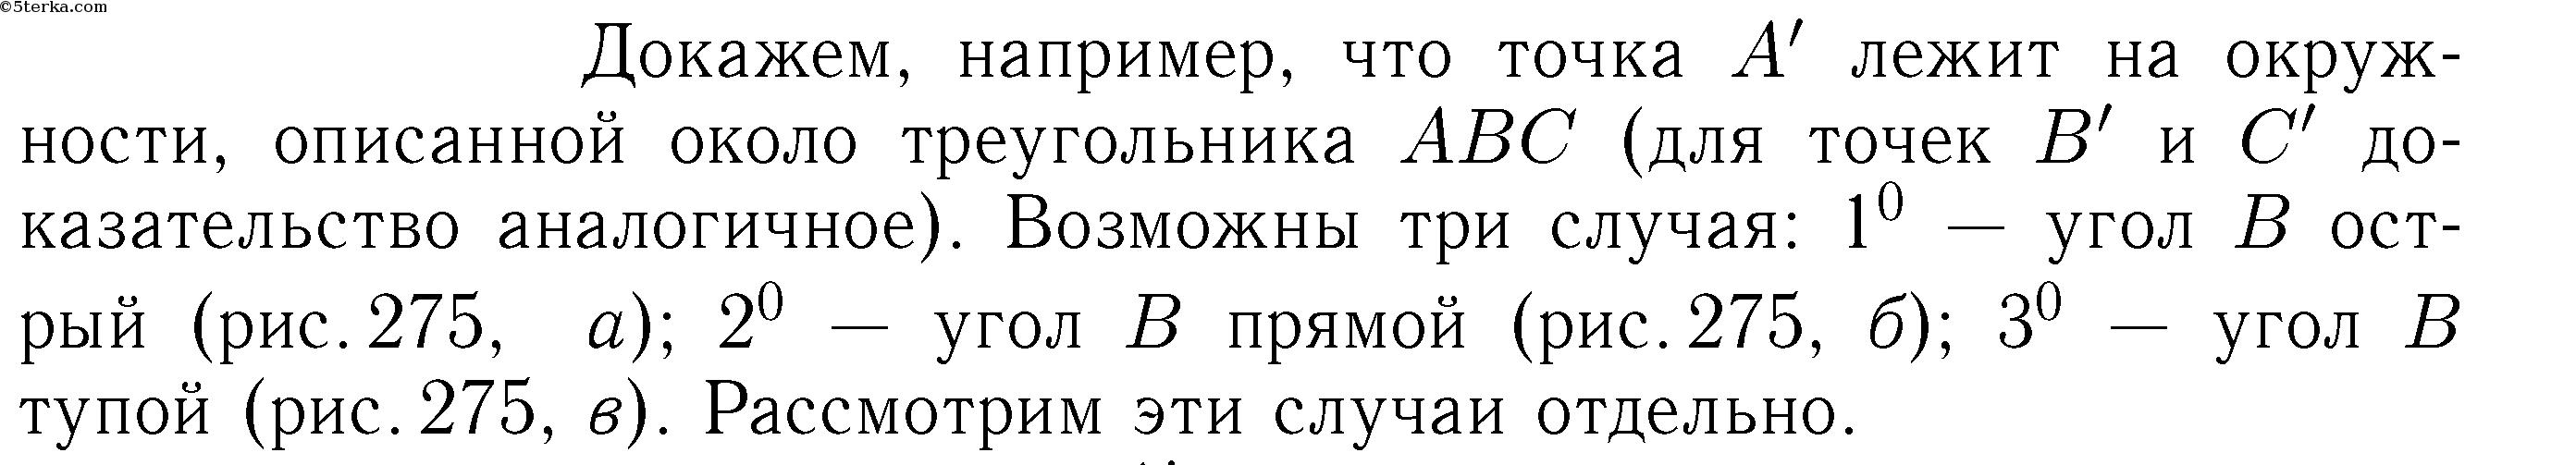 Решебник по Рабочей Тетради Английского языка 5 Класс Верещагина Афанасьева